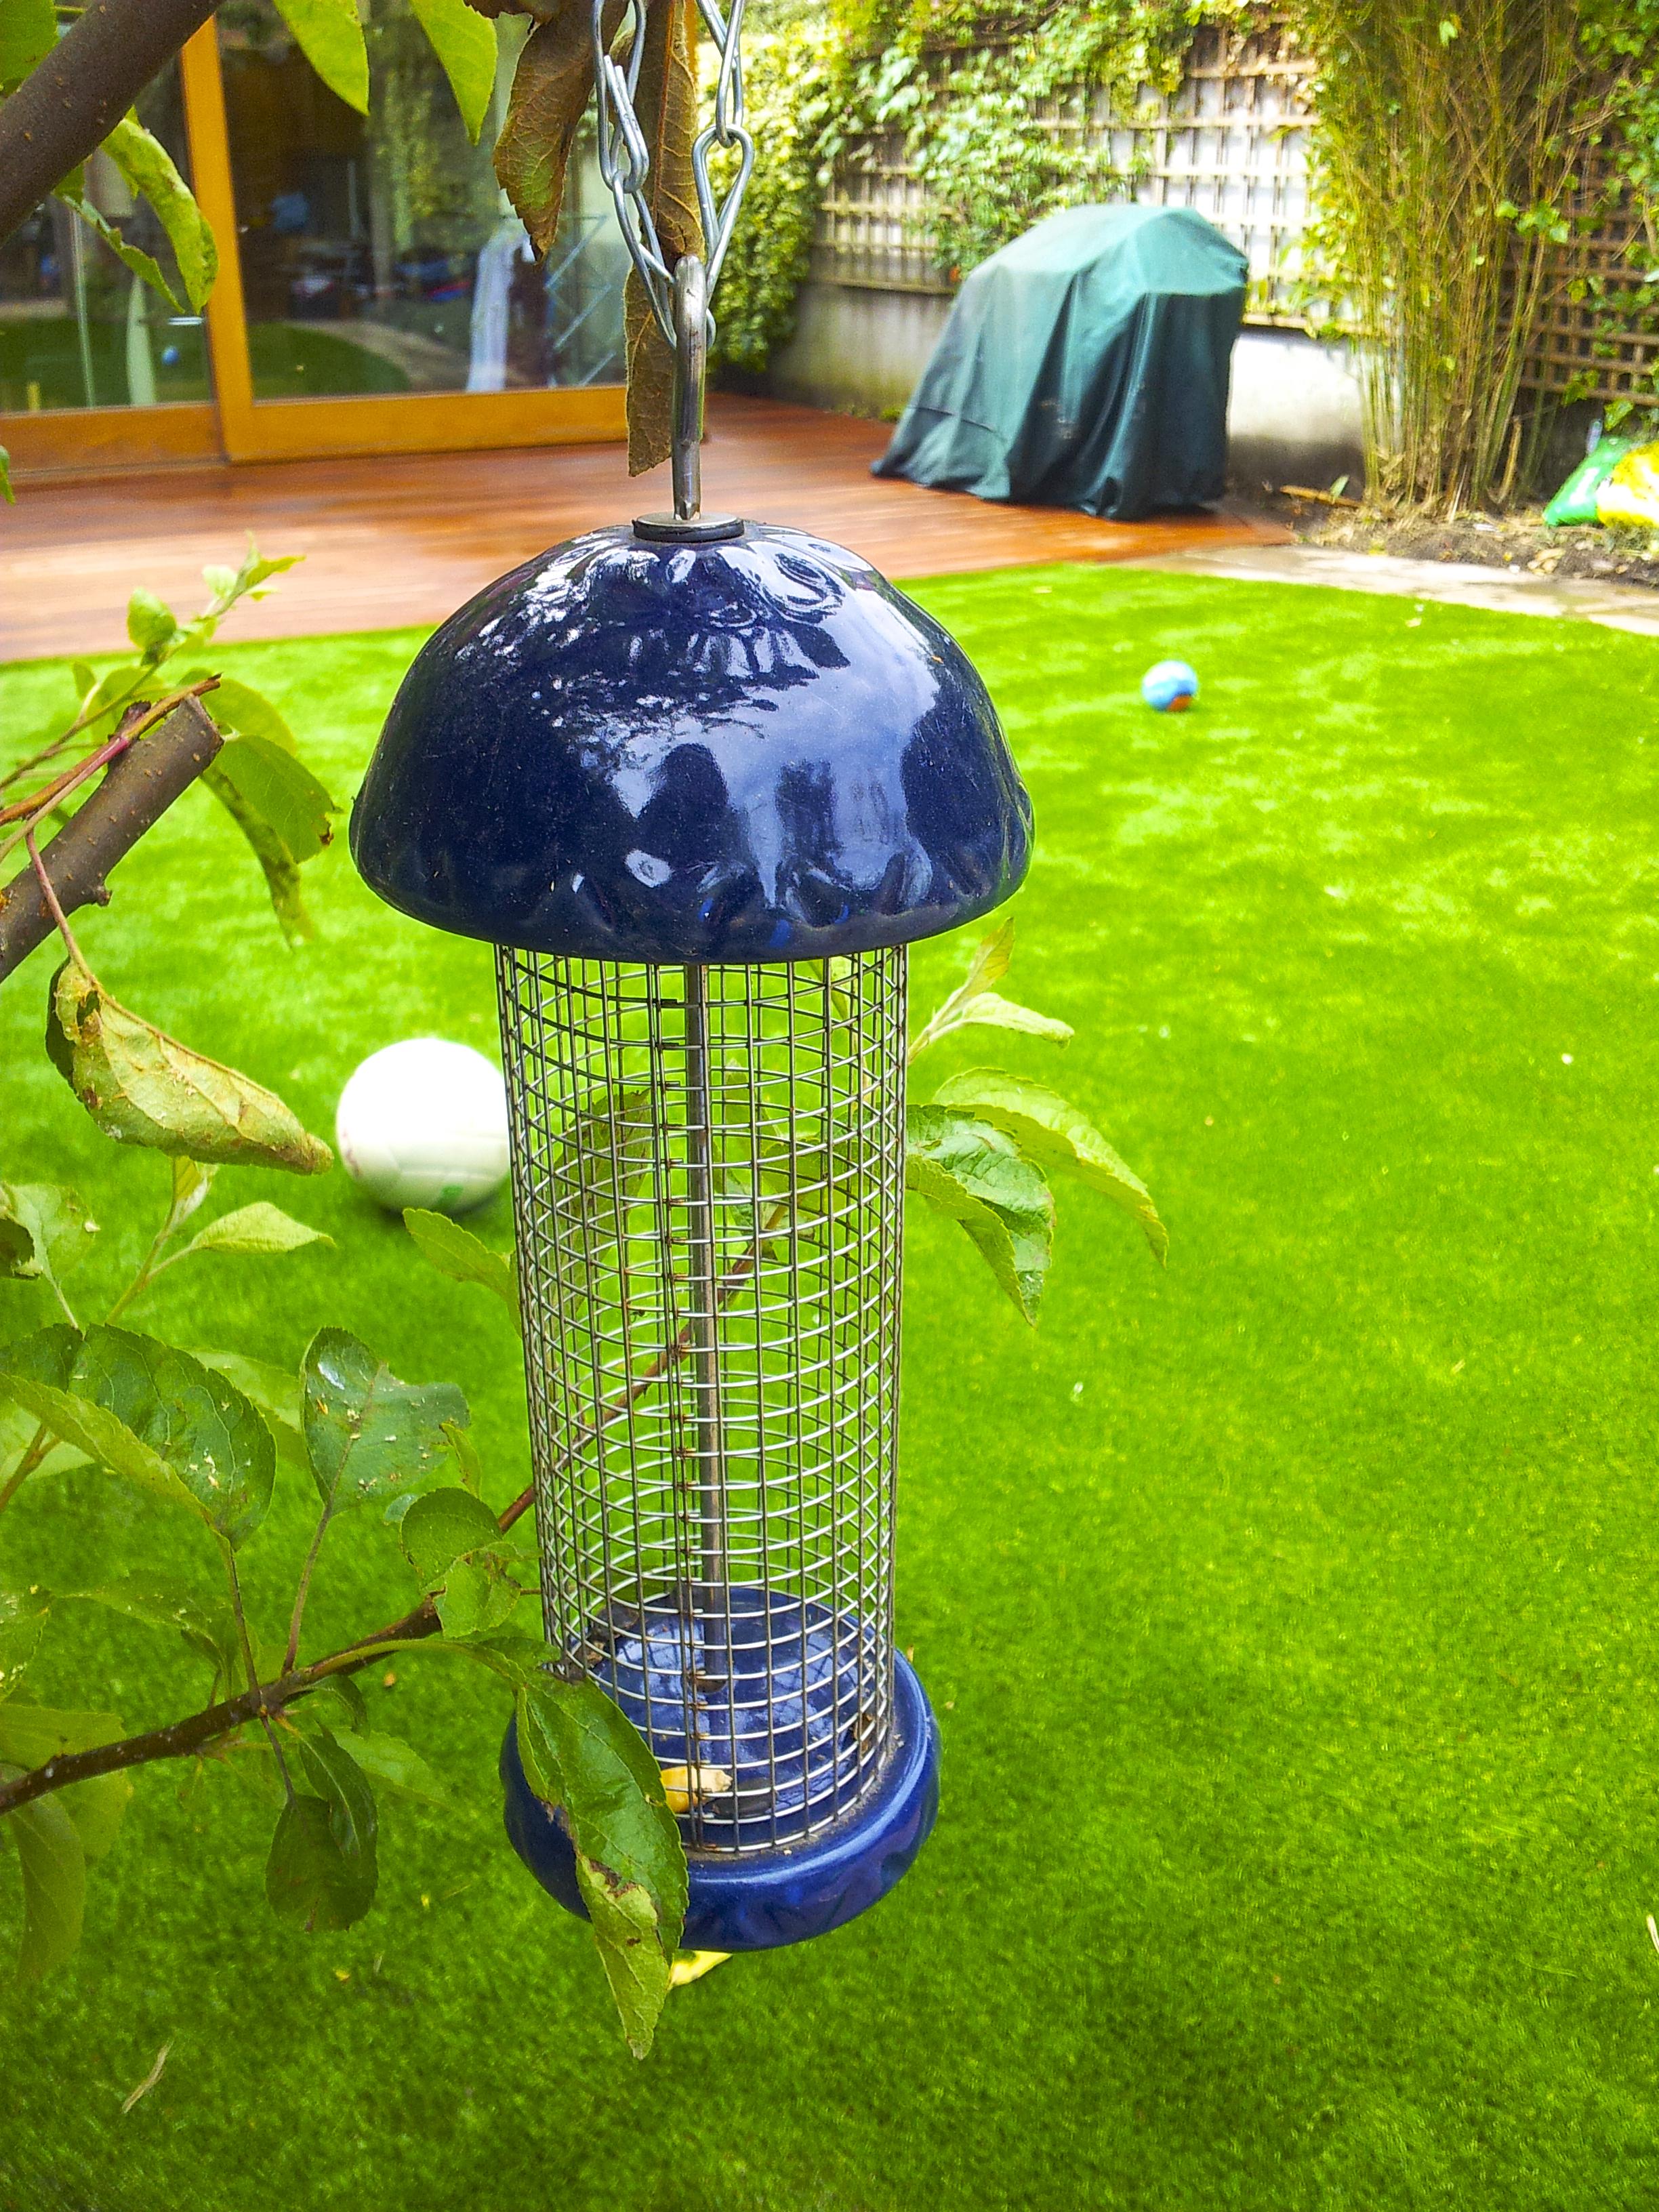 bird feeder and lawn